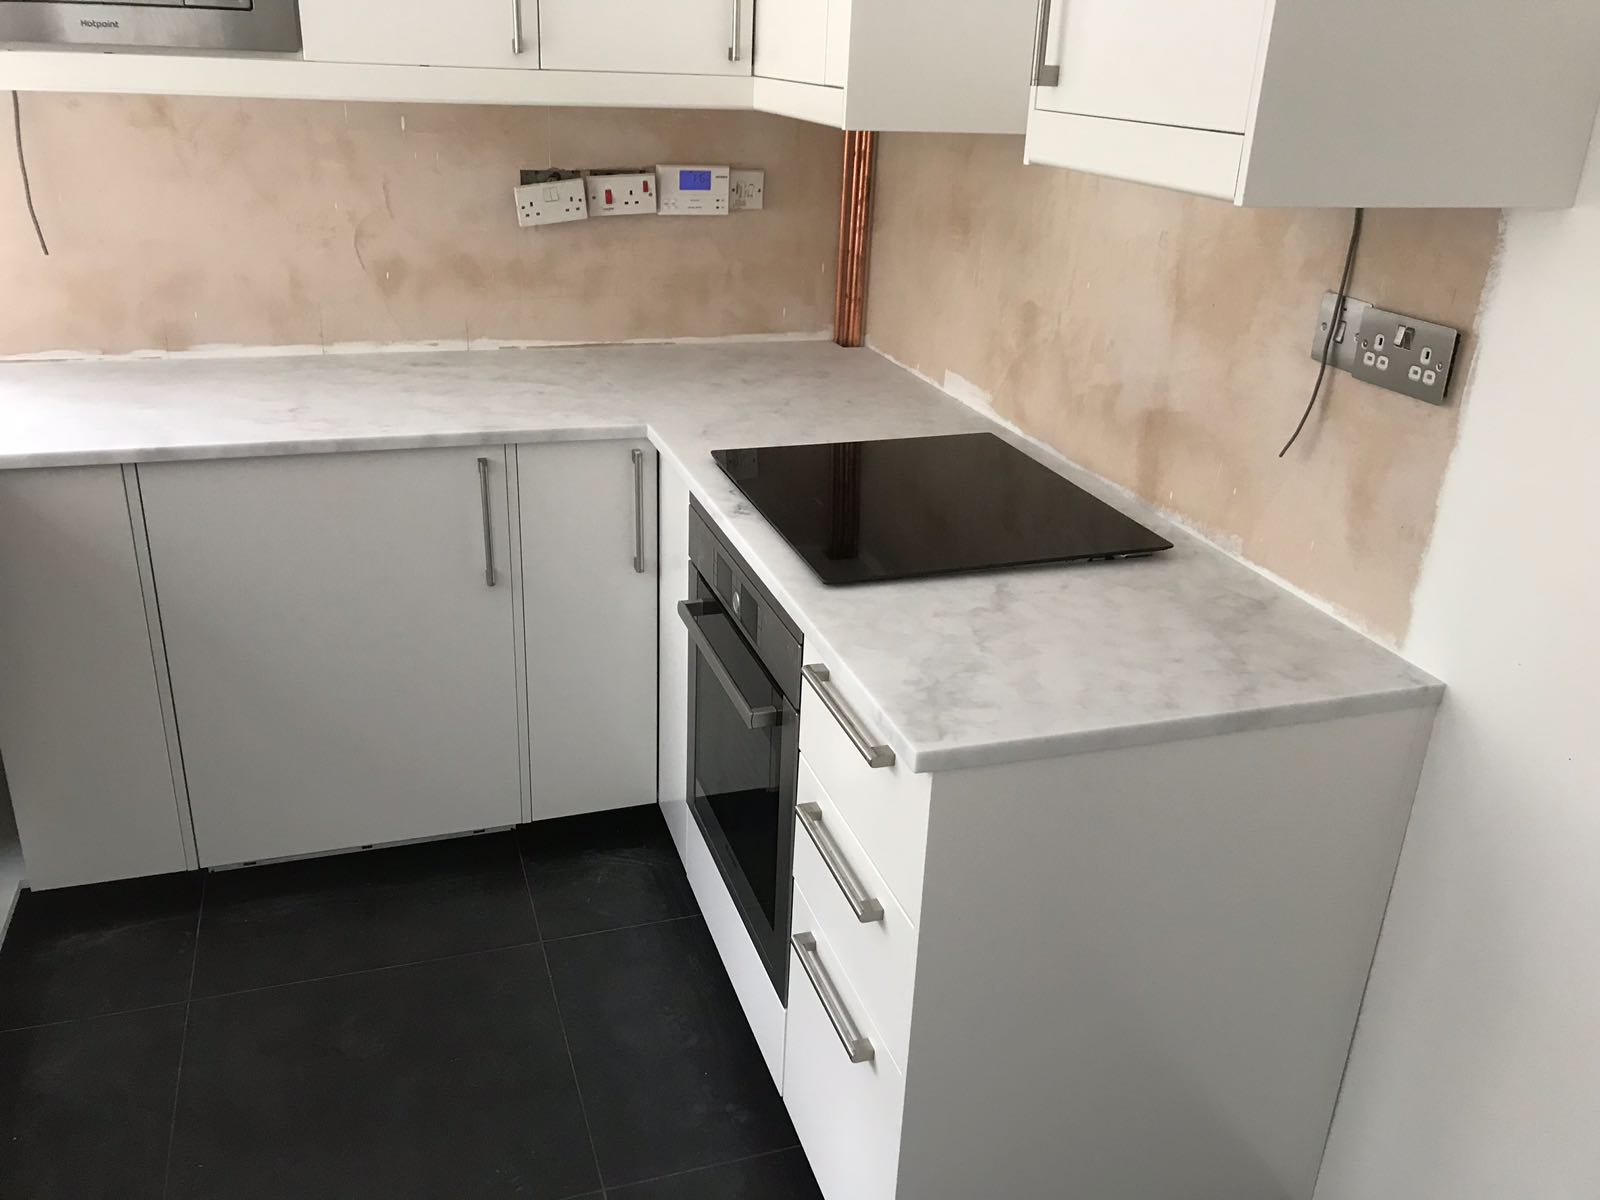 Carrara White, Woking, May 2018